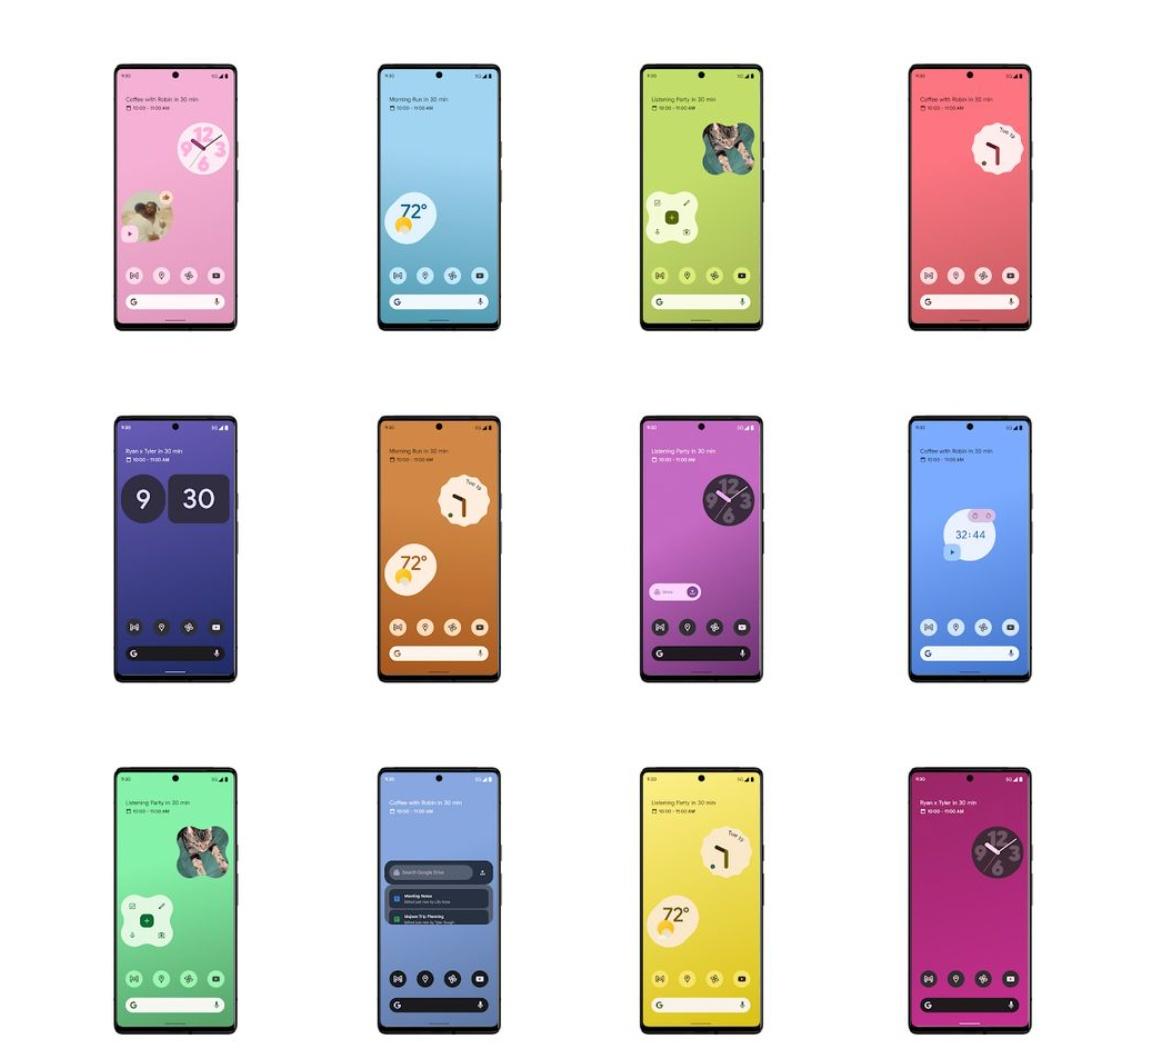 smartfon google pixel 6 android 12 smartphone